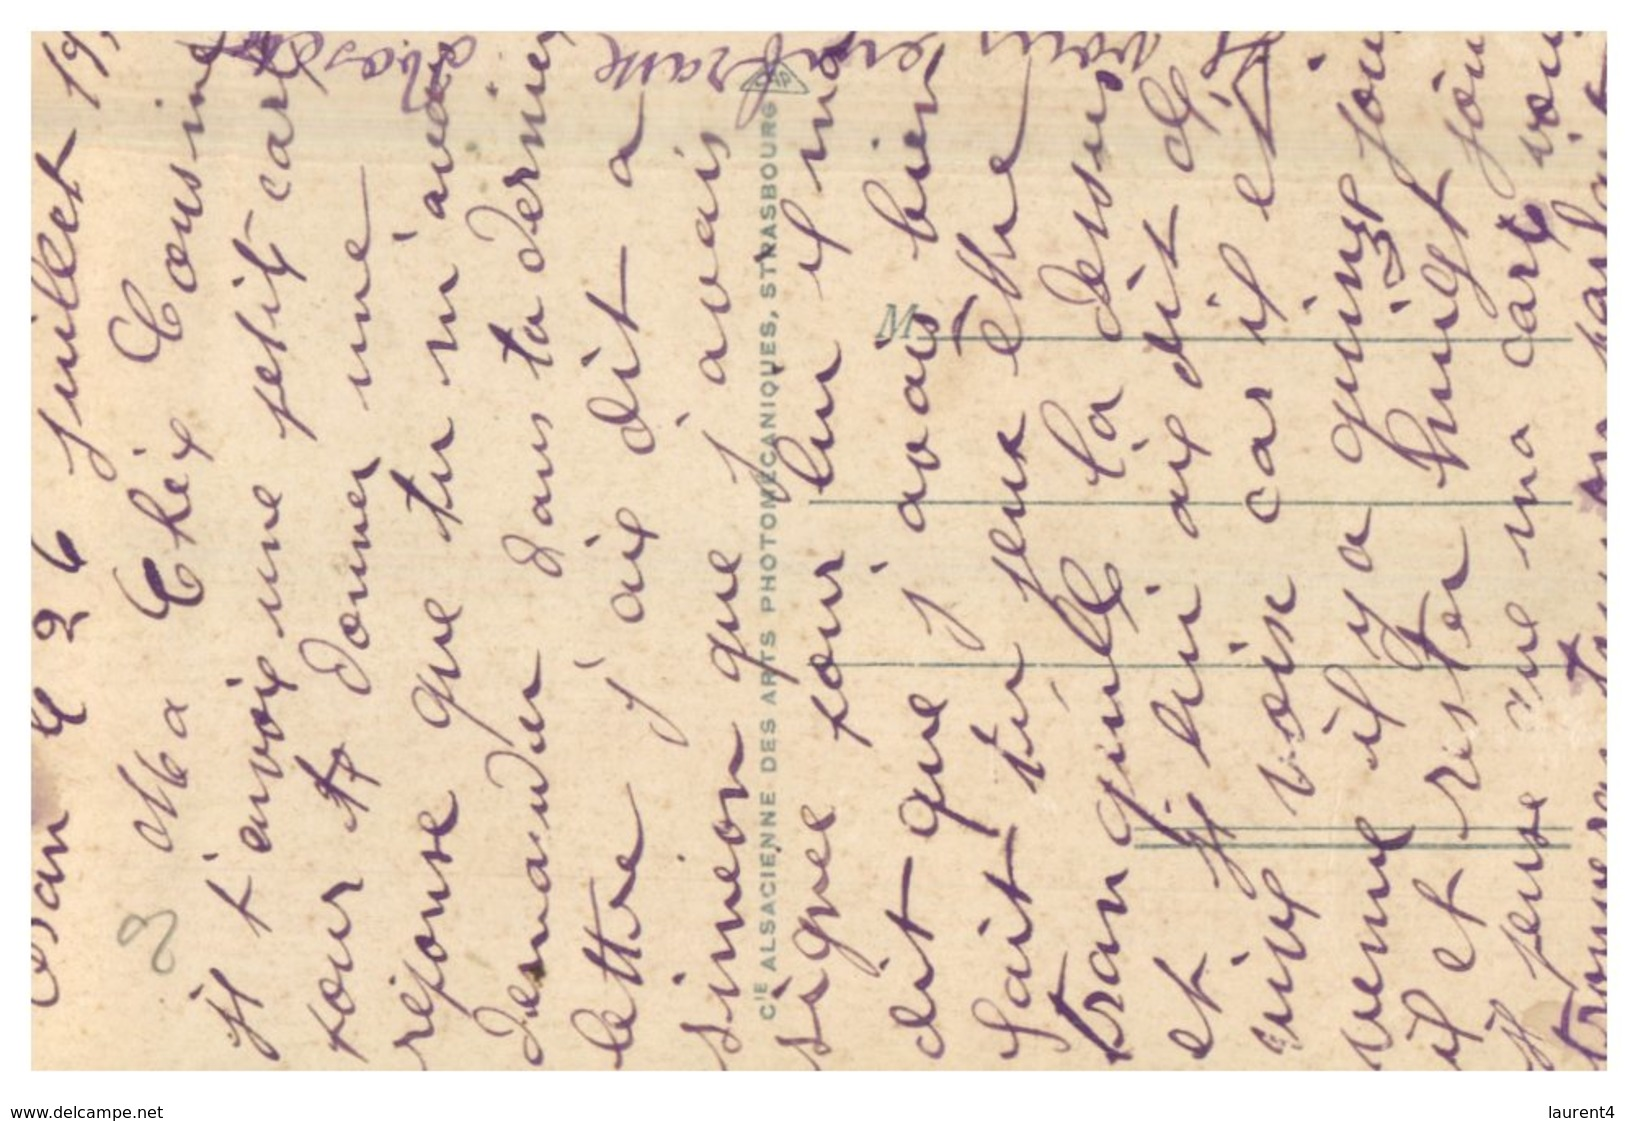 (ORL 638) Very Old Postcard - Oran - Le Courrier De France (cruise Sip / Paquebot) - Dampfer